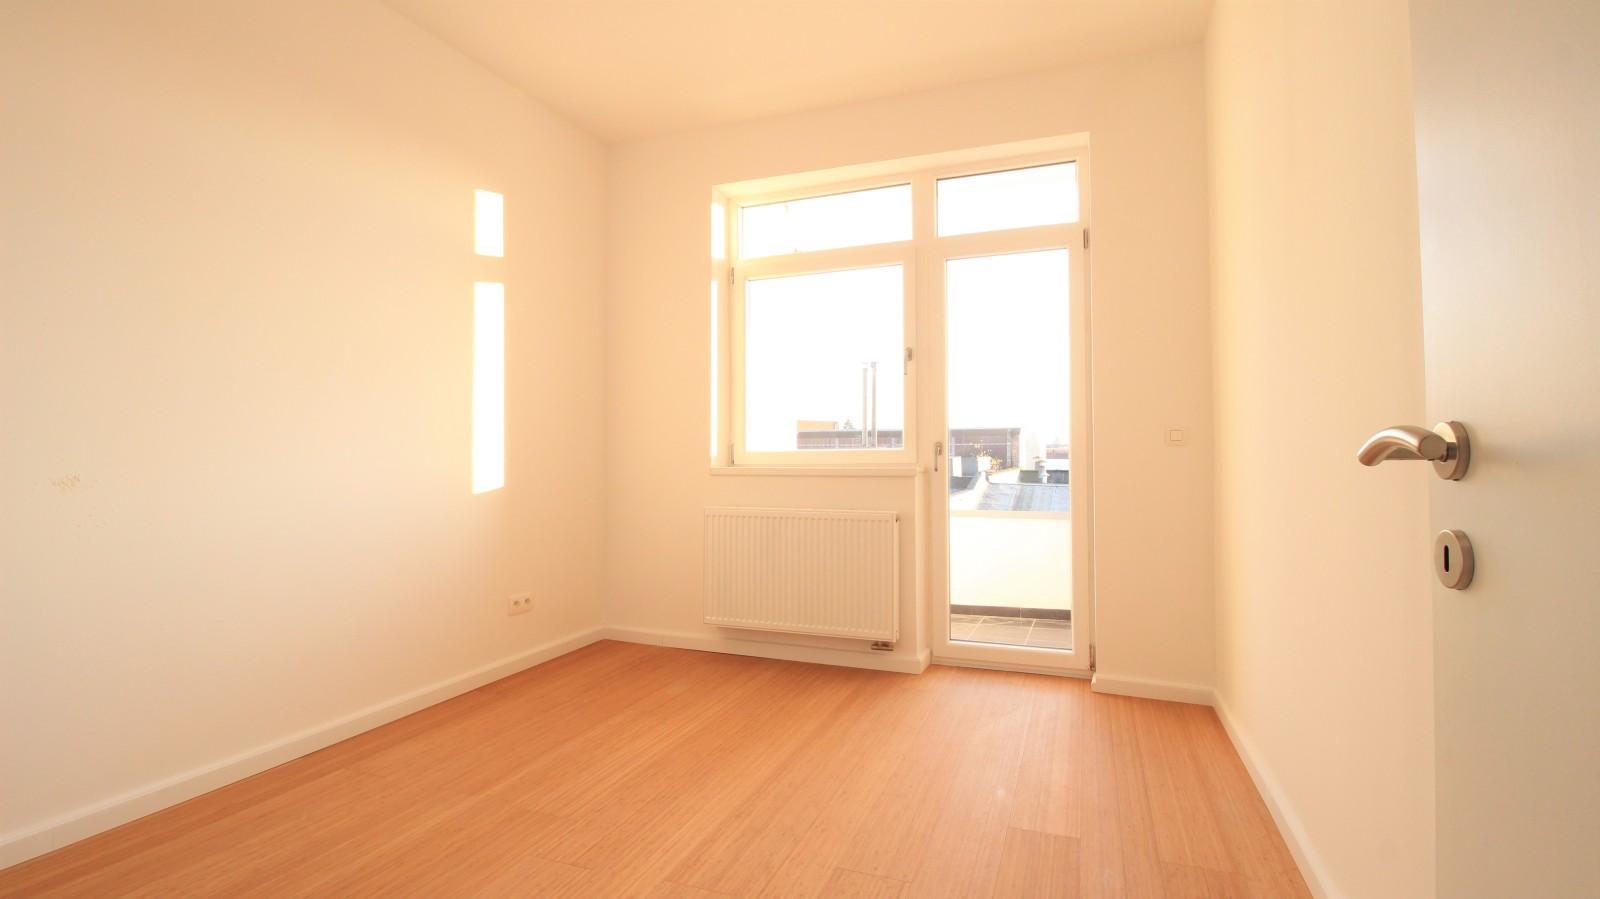 Gerenoveerd appartement met twee slaapkamers op centrale ligging te Mortsel! afbeelding 6